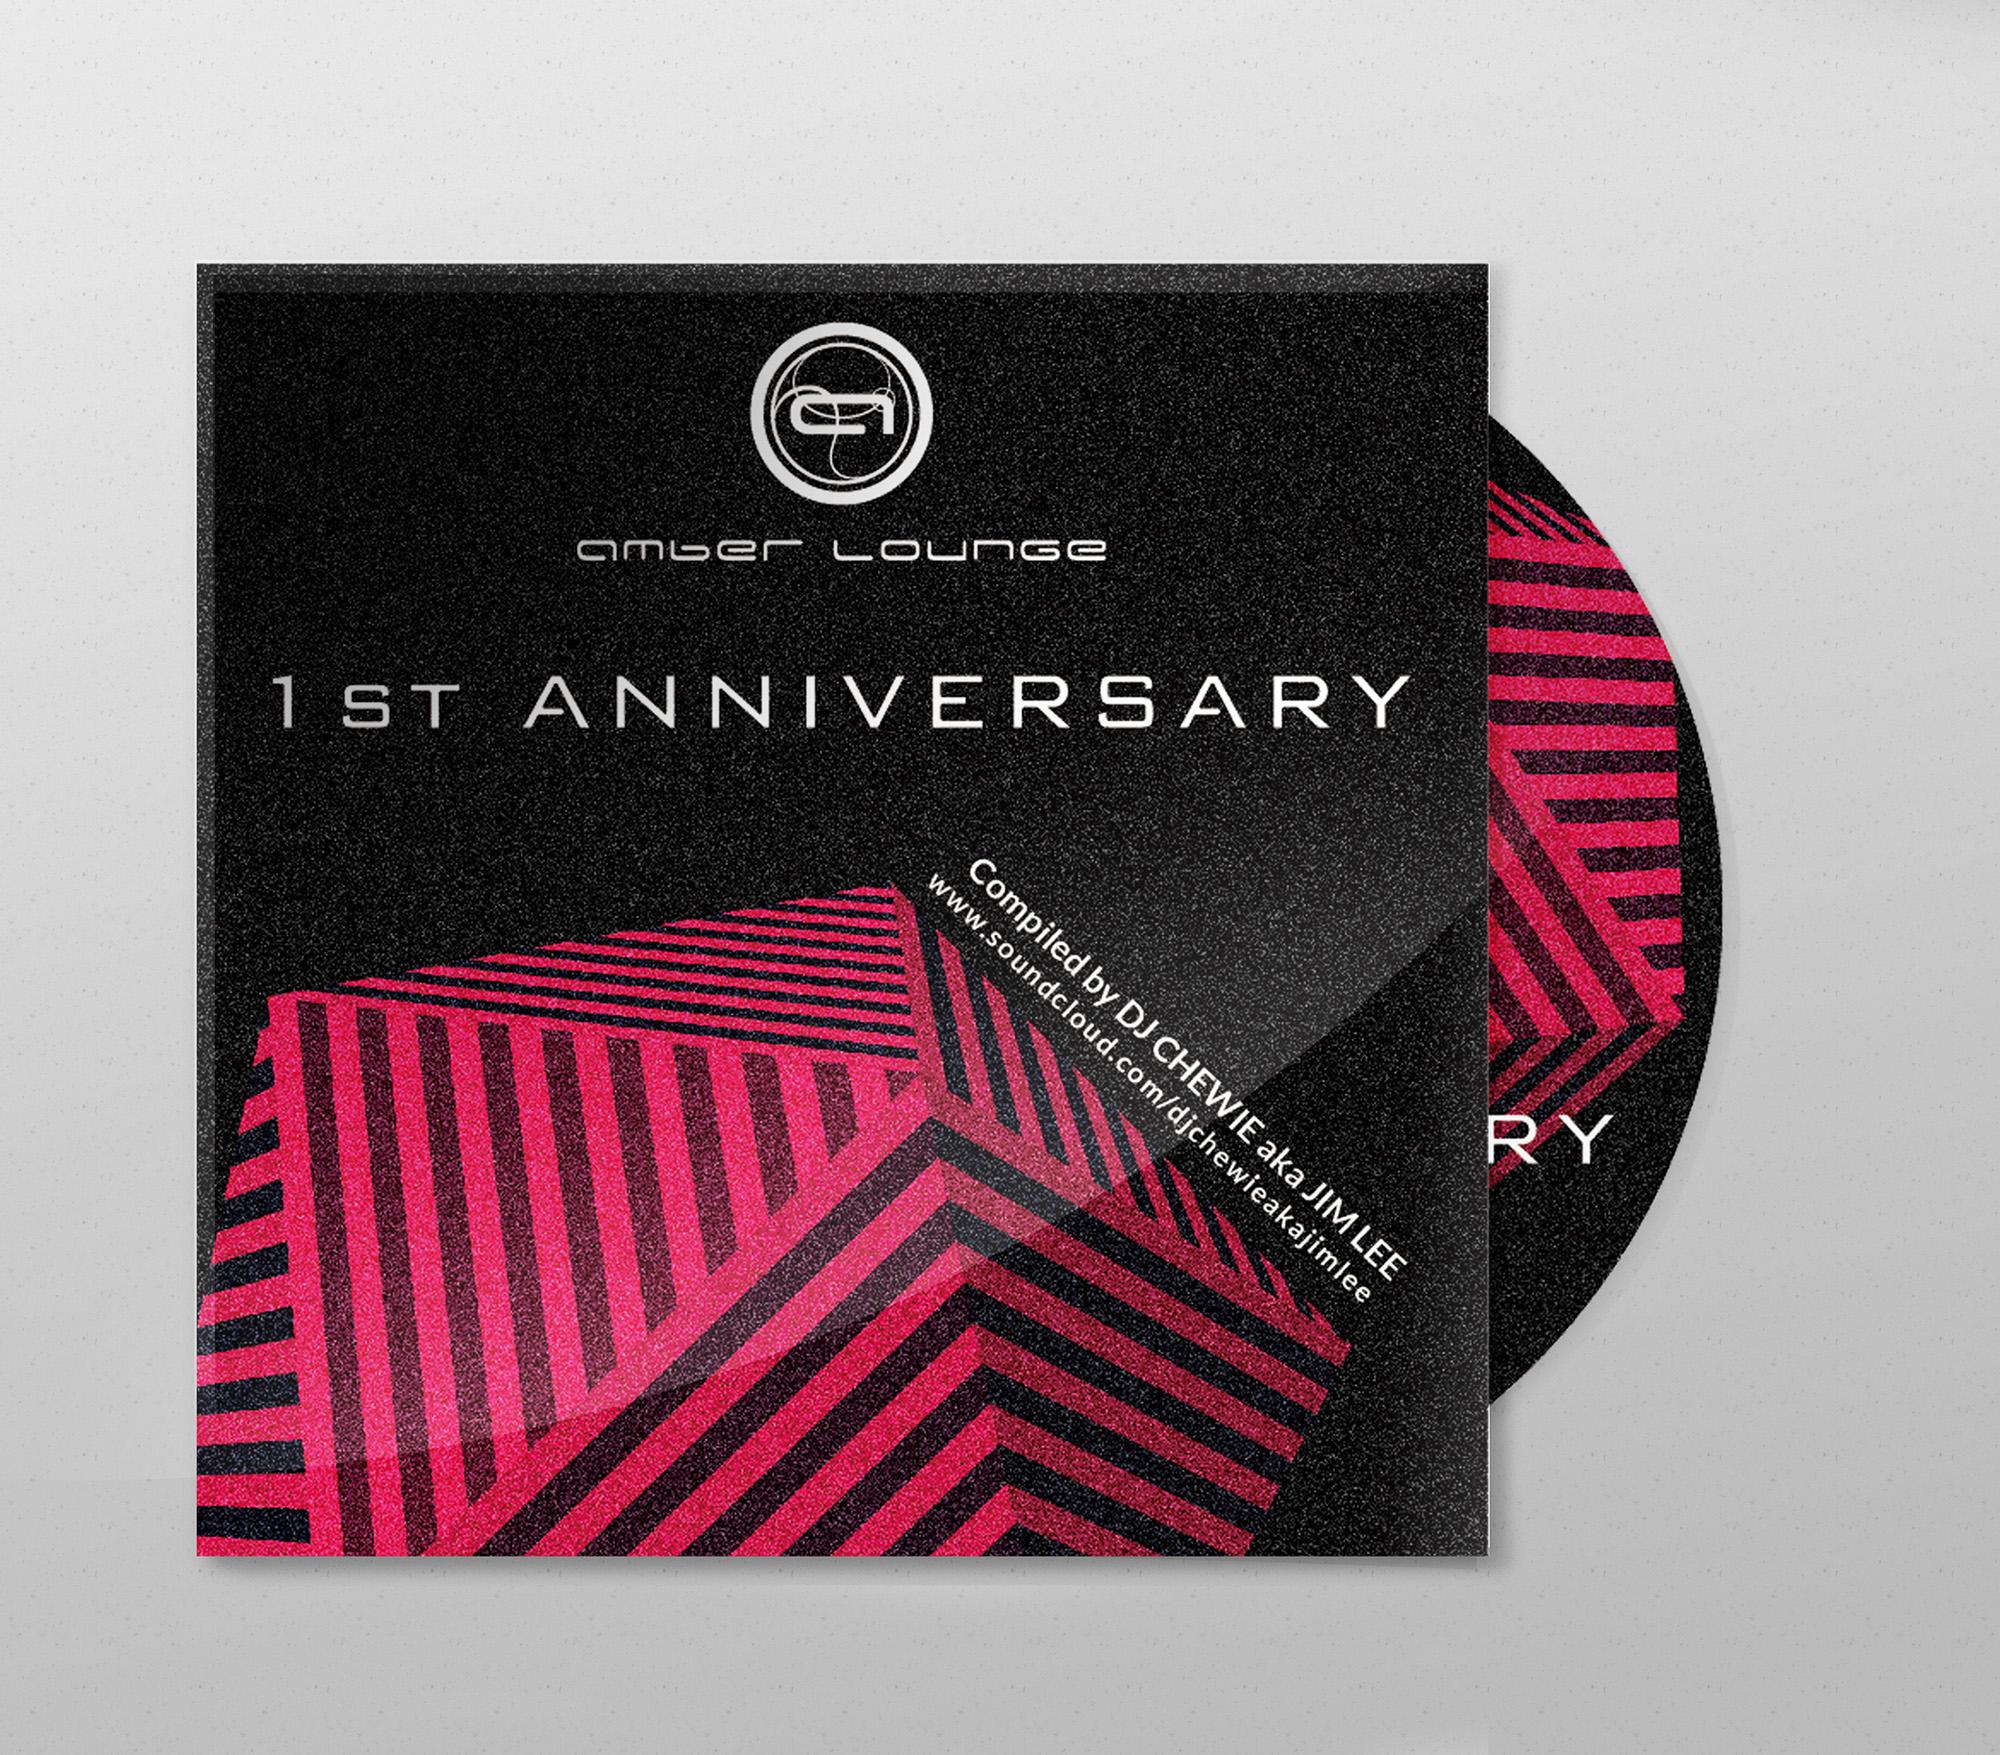 amber lounge : 1st Anniversary privilege gift CD